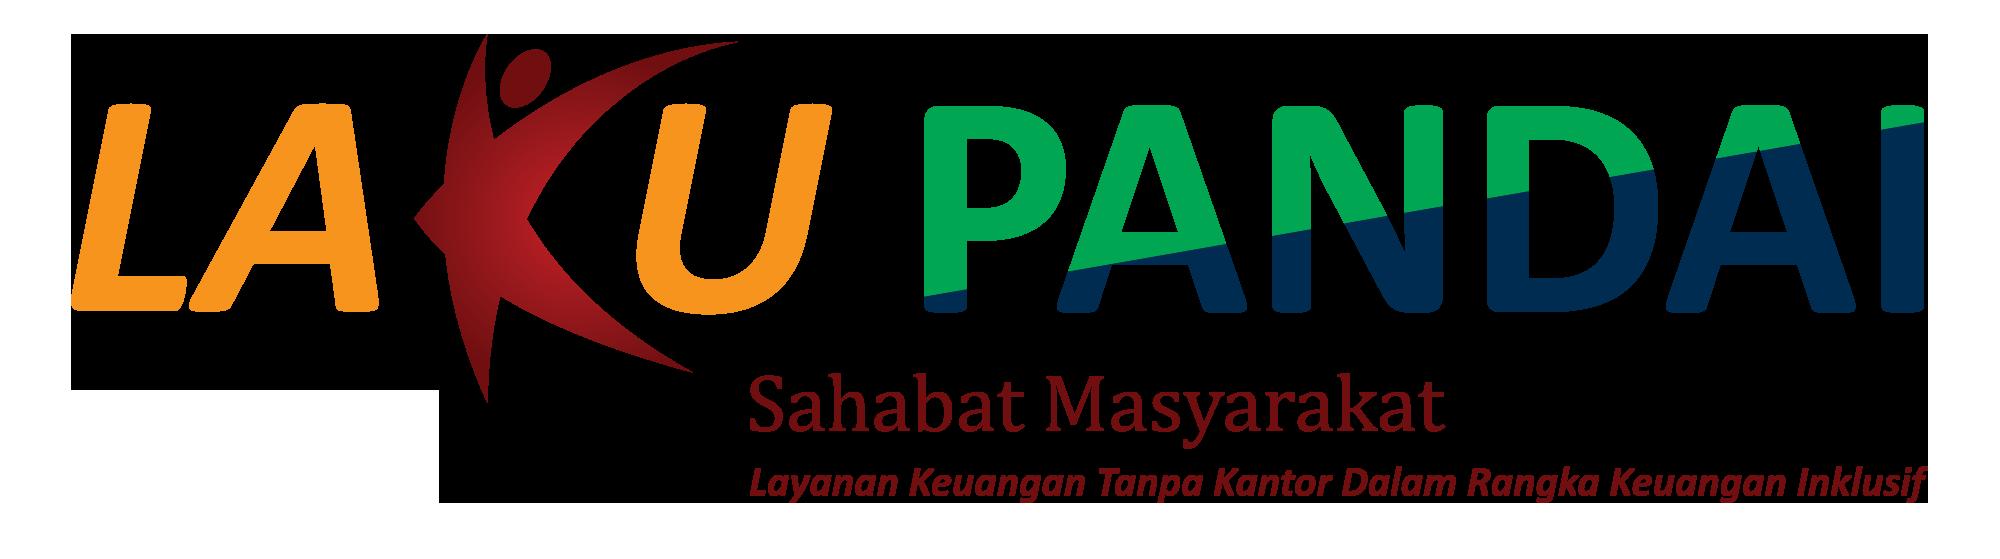 Image result for laku pandai